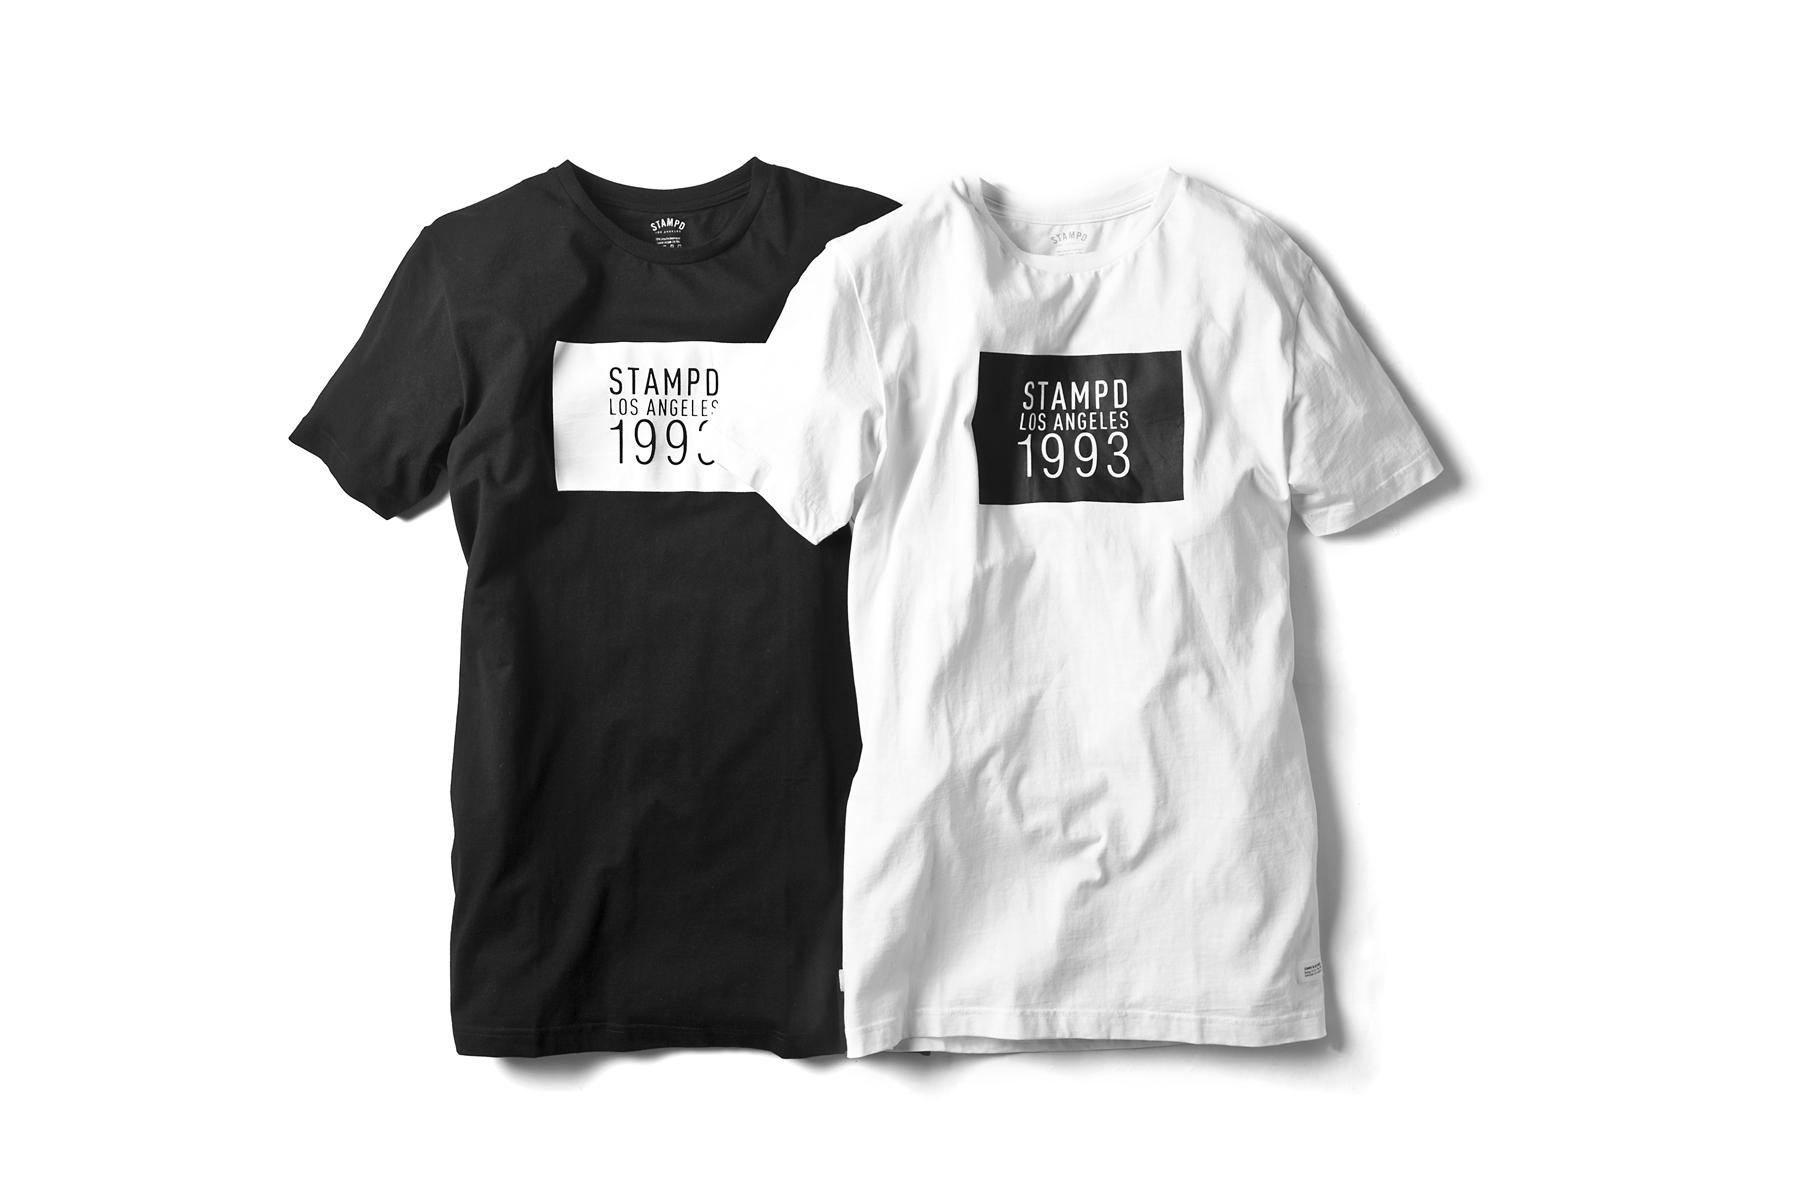 stampd-2014-spring-summer-t-shirts-0